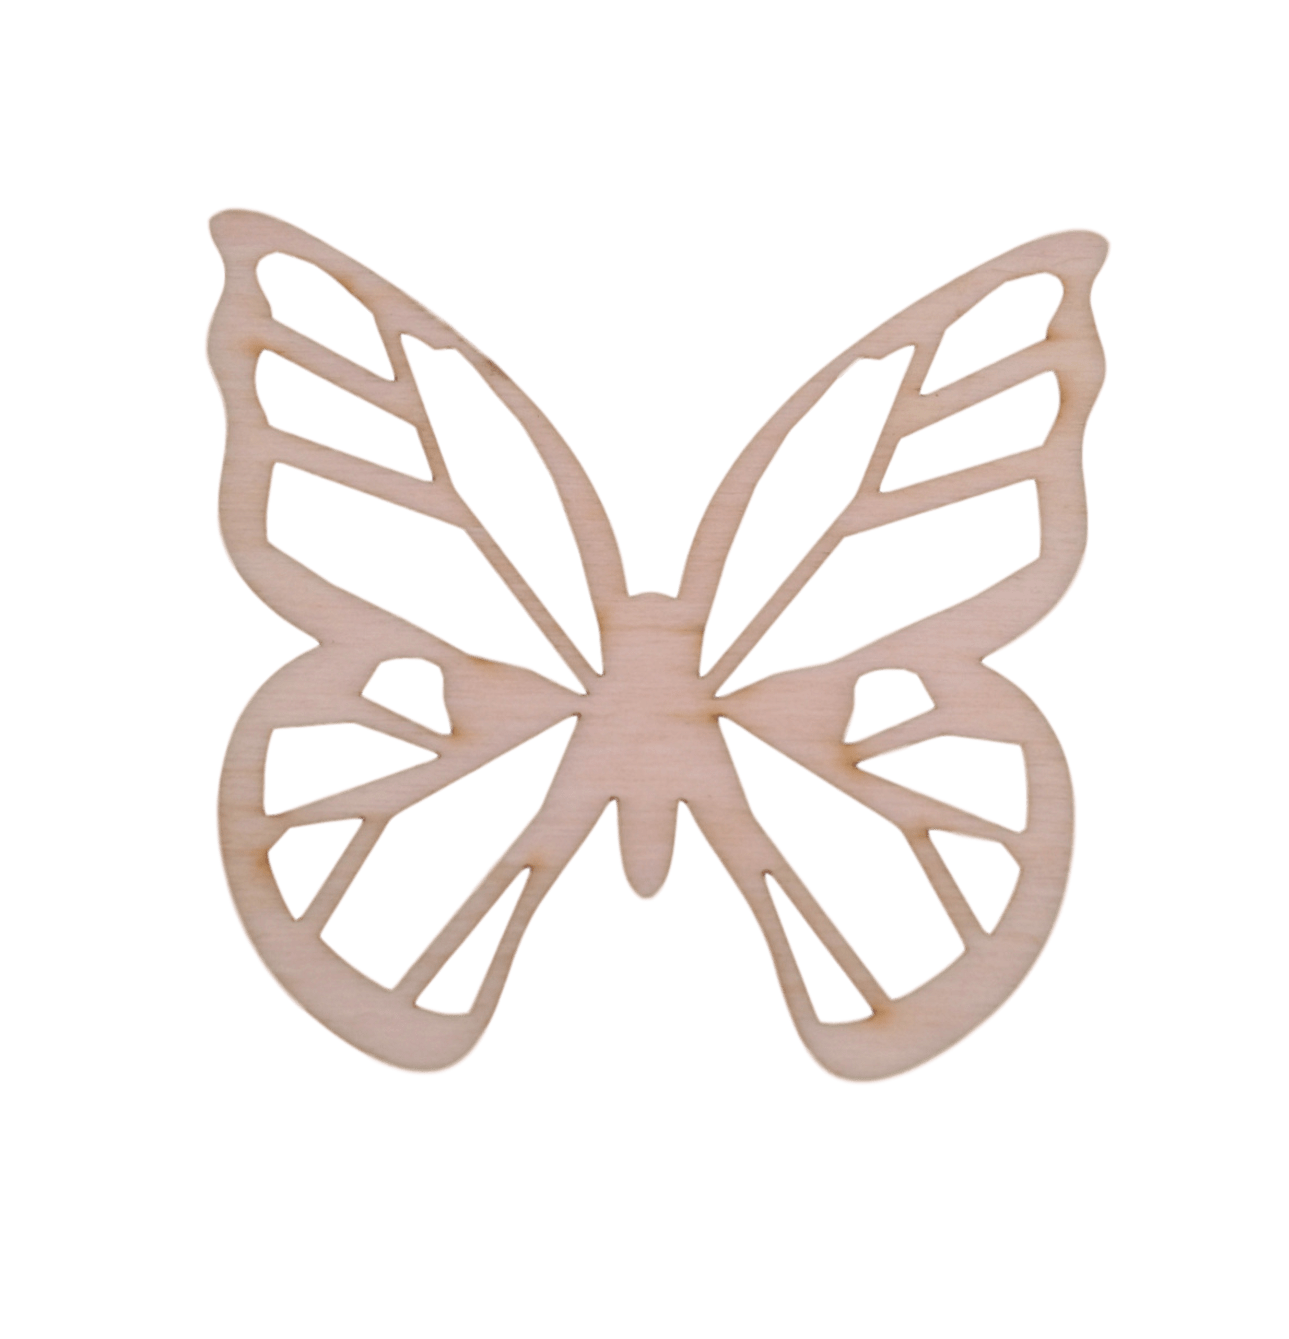 Prikupen lik metulja